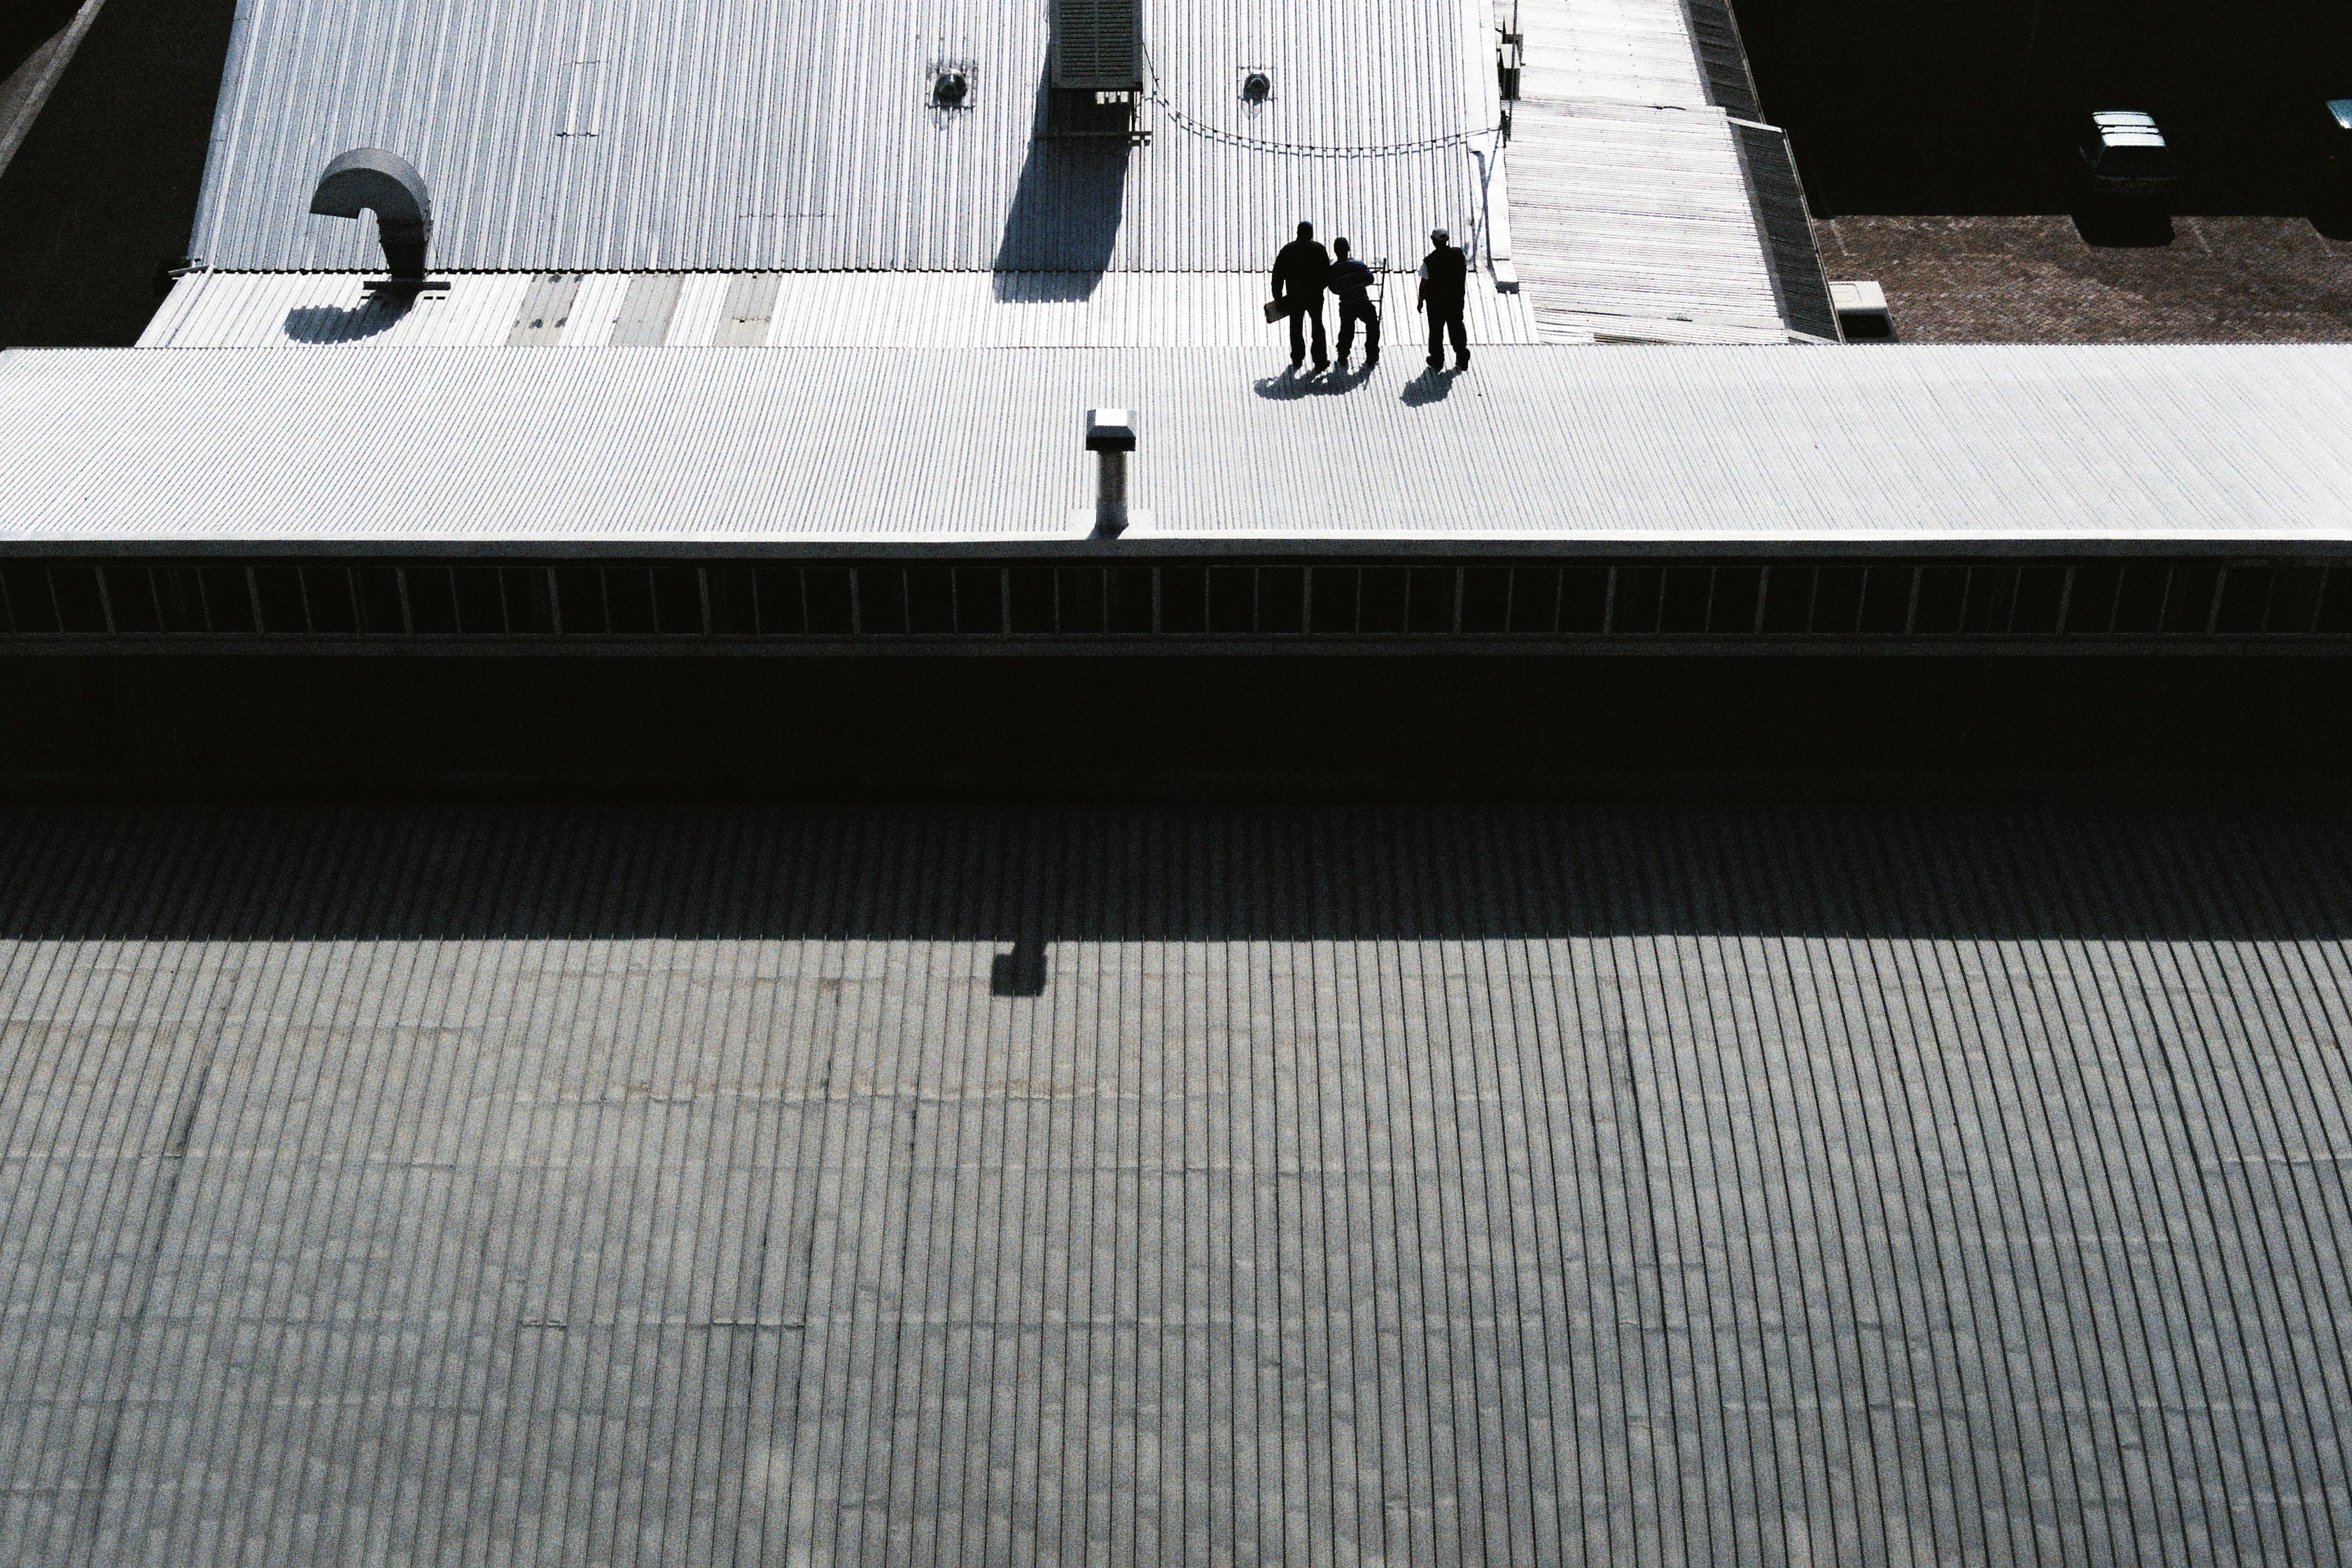 Shadows of men working on rooftop in Woodstock